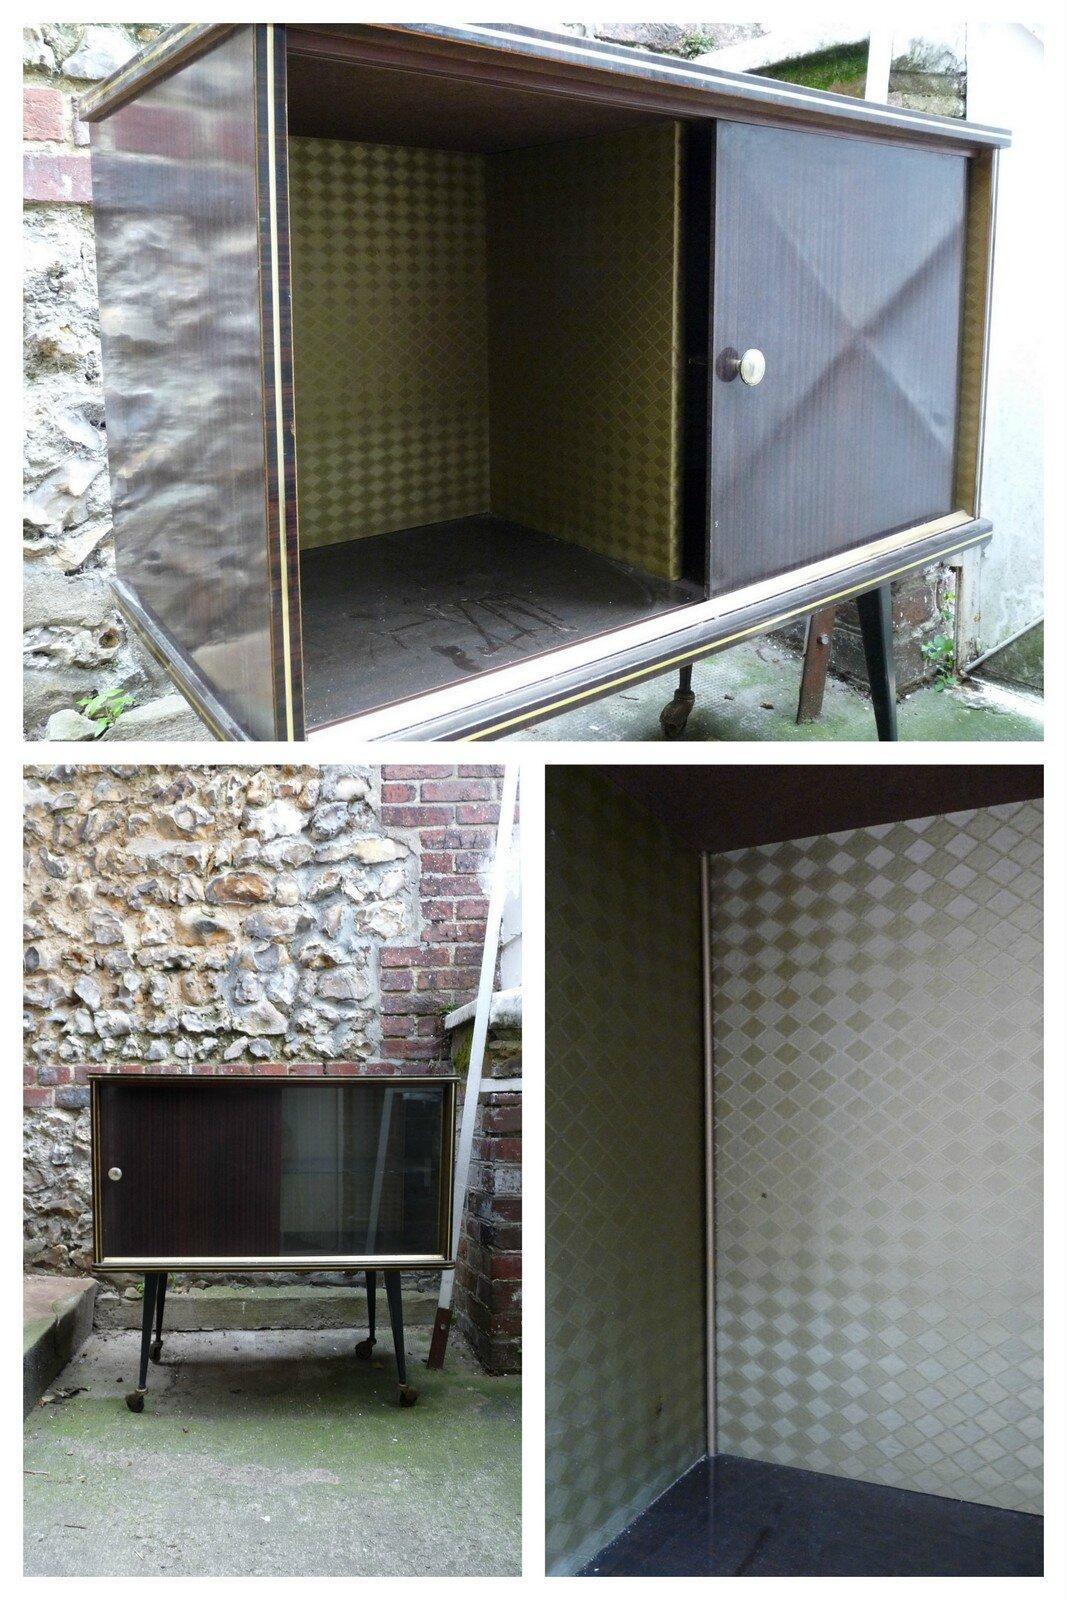 relooker un meuble bar en formica un rien une id e une bricole ma bricole. Black Bedroom Furniture Sets. Home Design Ideas